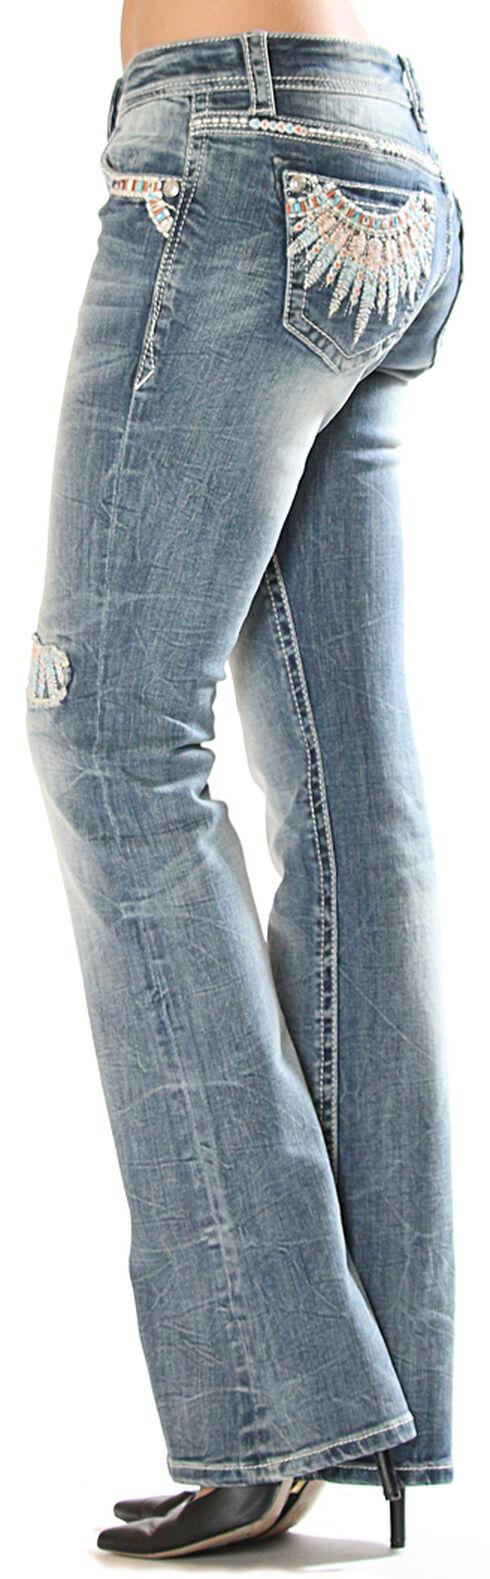 Grace in LA Women's Feather Pocket Jeans - Boot Cut , Medium Blue, hi-res